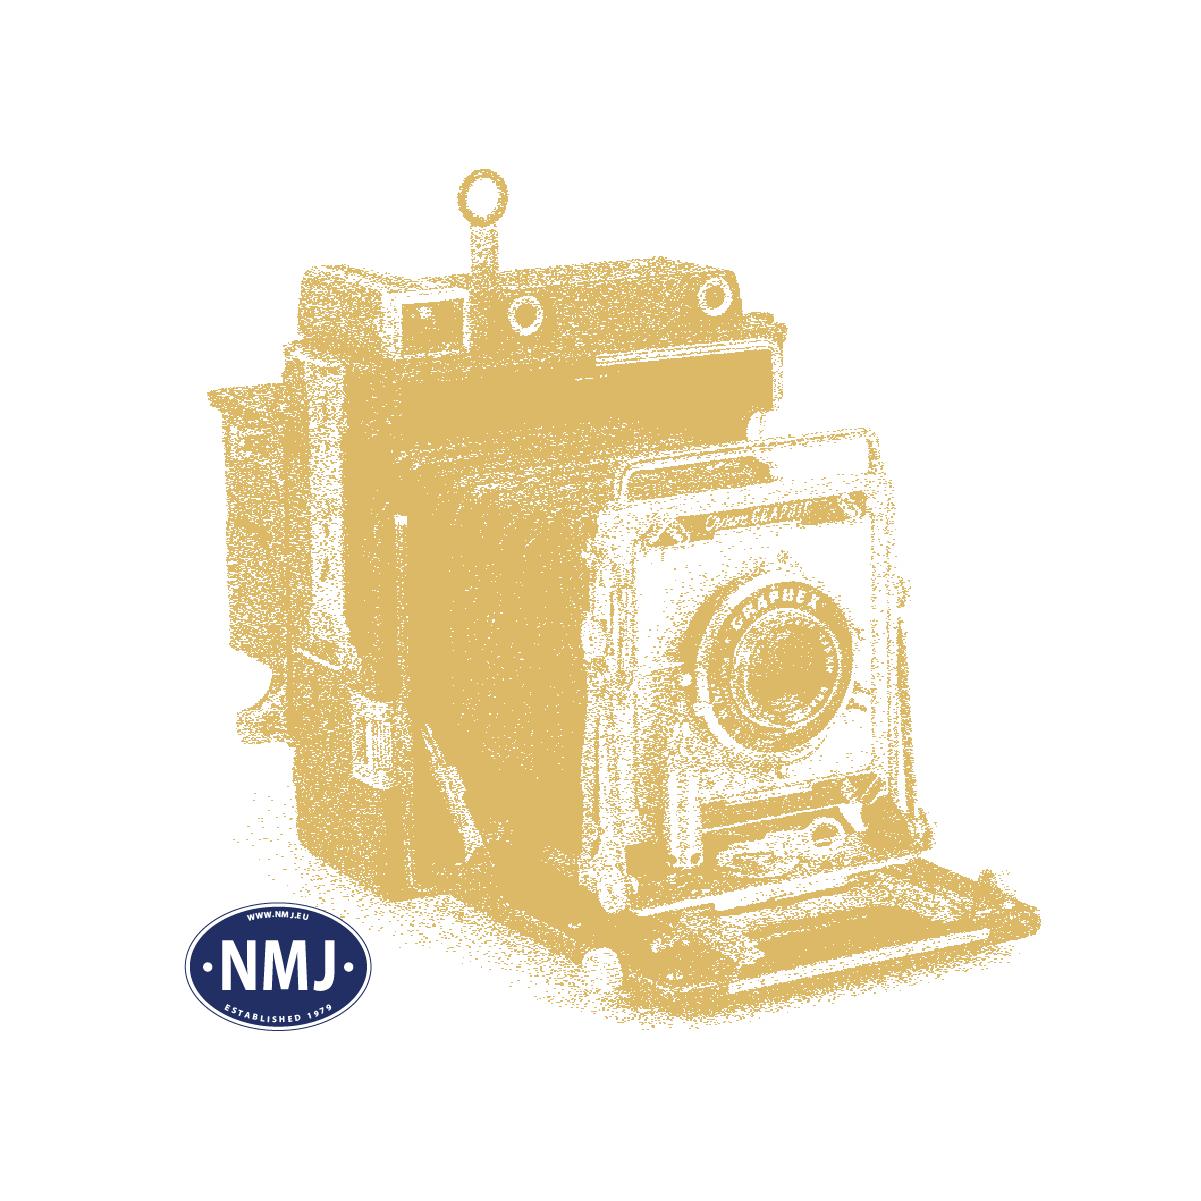 NMJT90207 - NMJ Topline MAV M61.005, DCC m/ Lyd